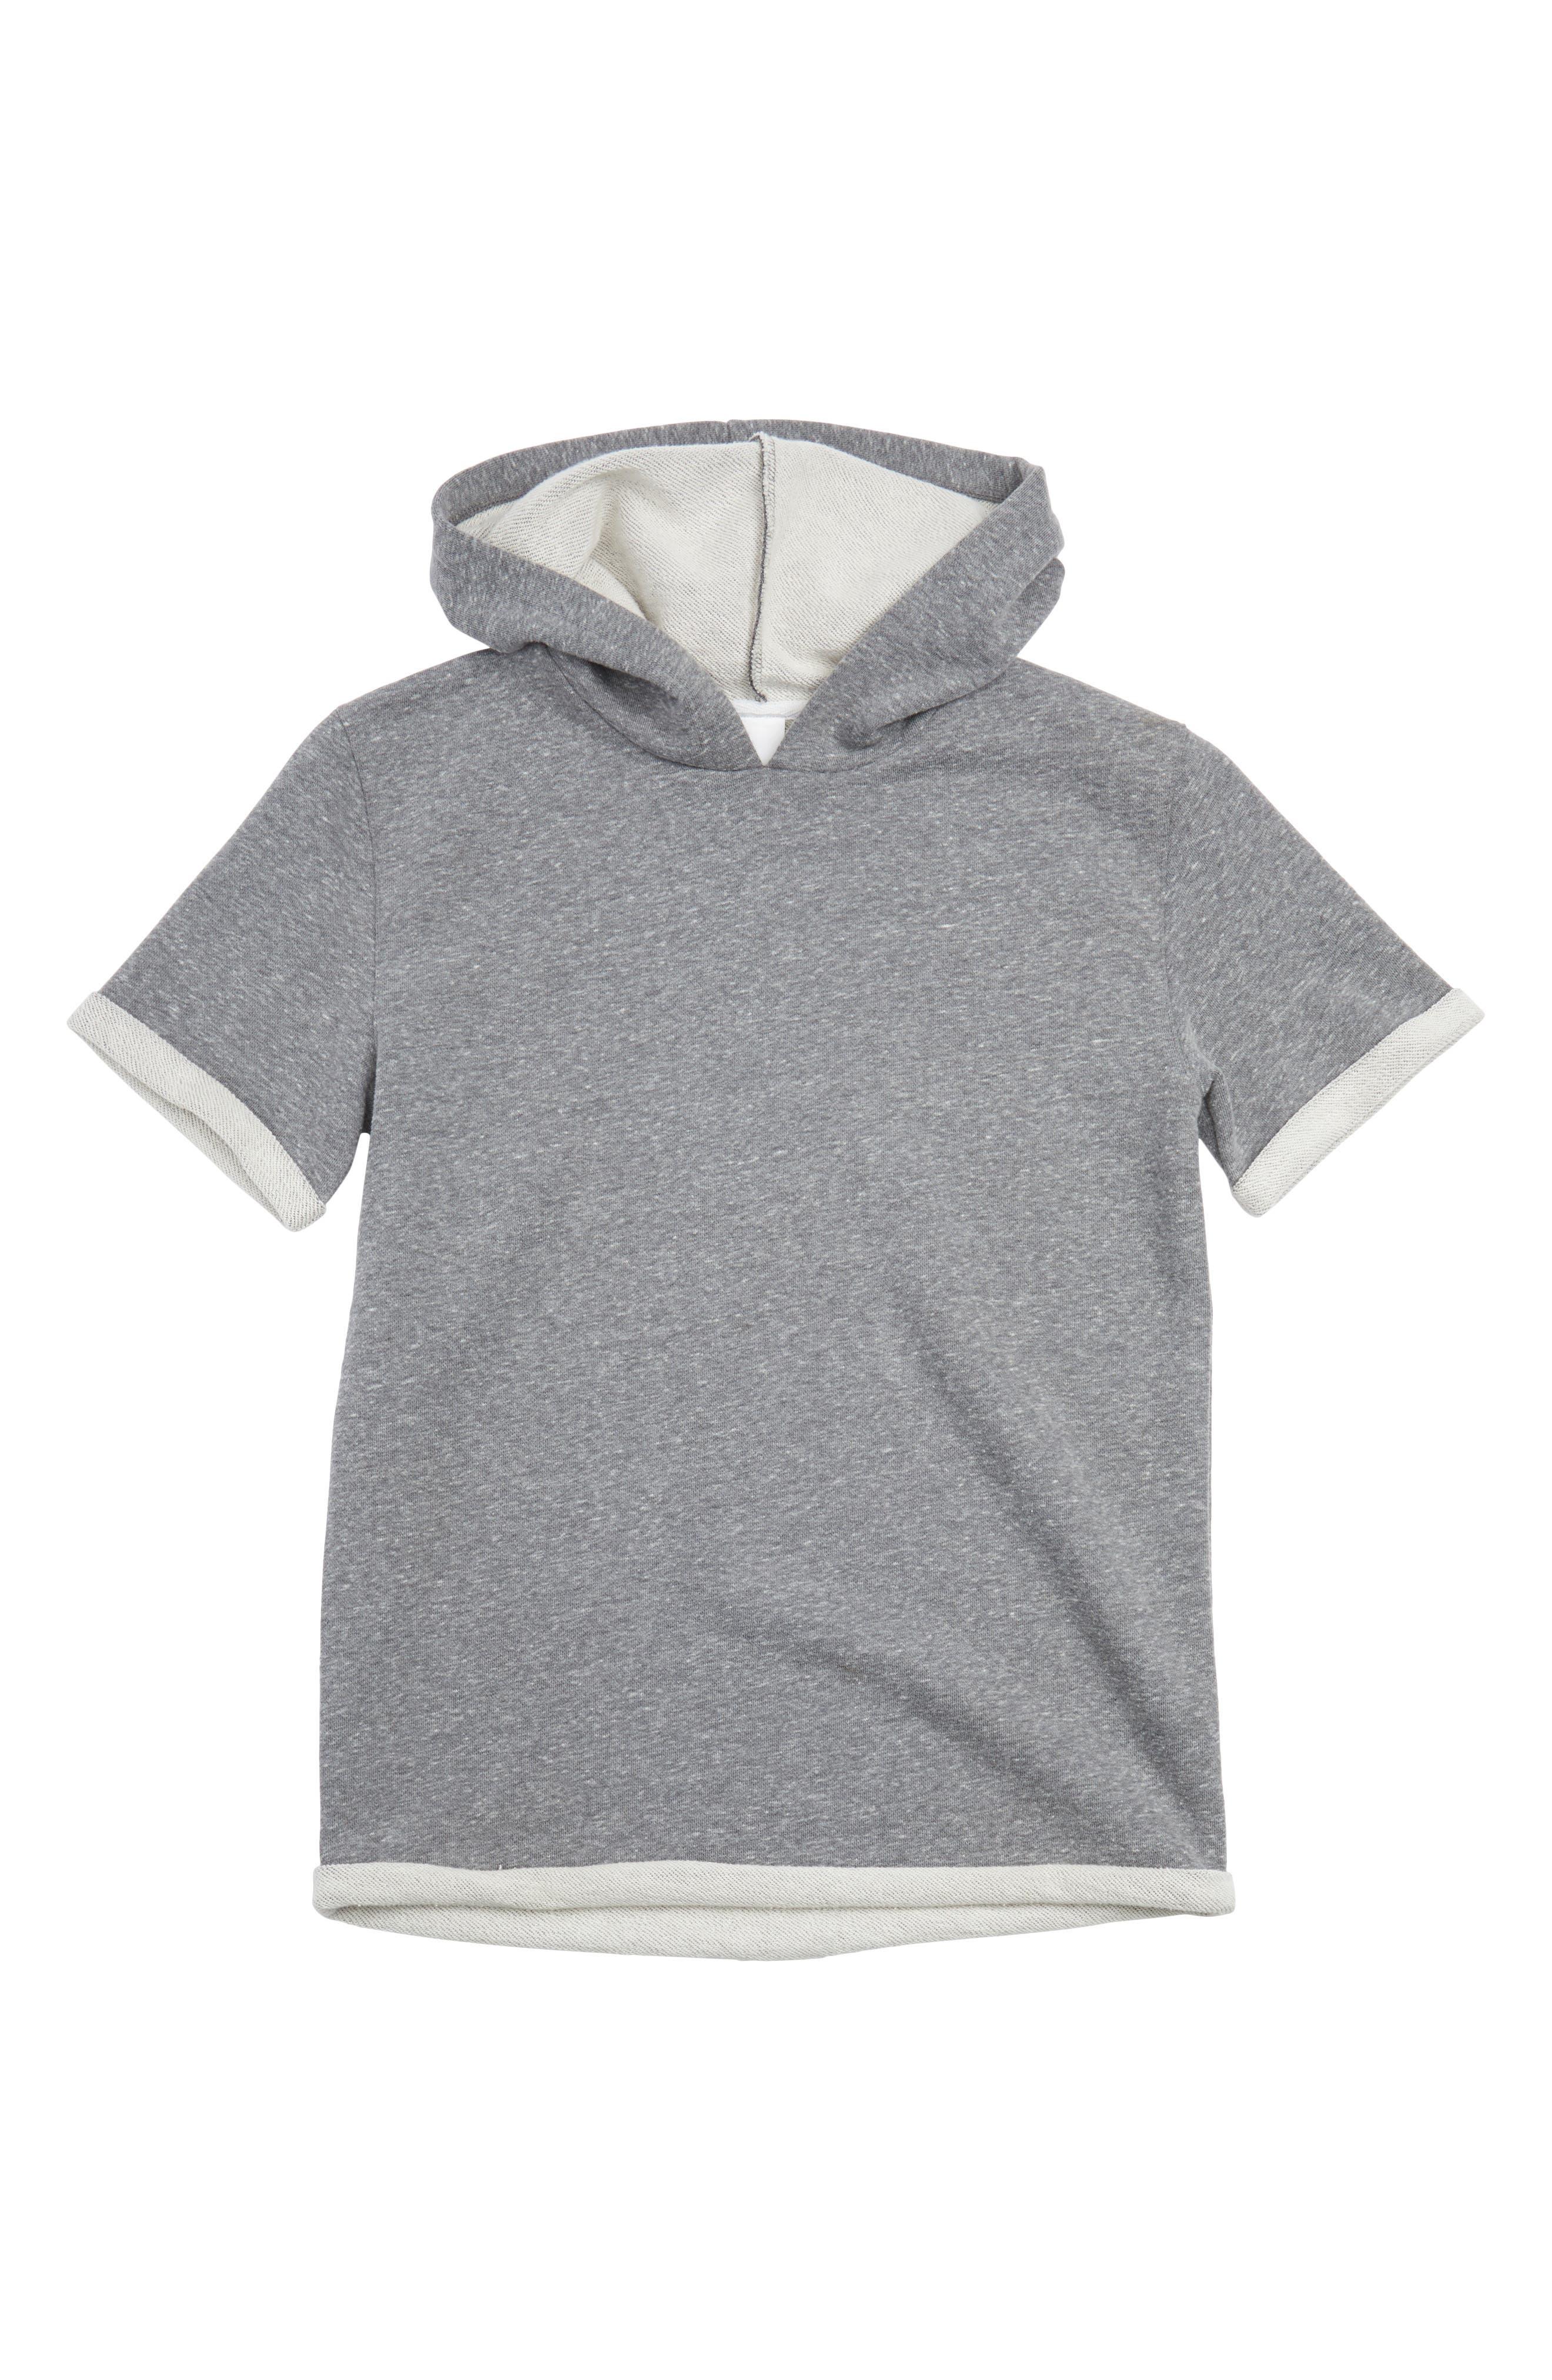 Main Image - Treasure & Bond Hooded Short Sleeve Sweatshirt (Big Boys)